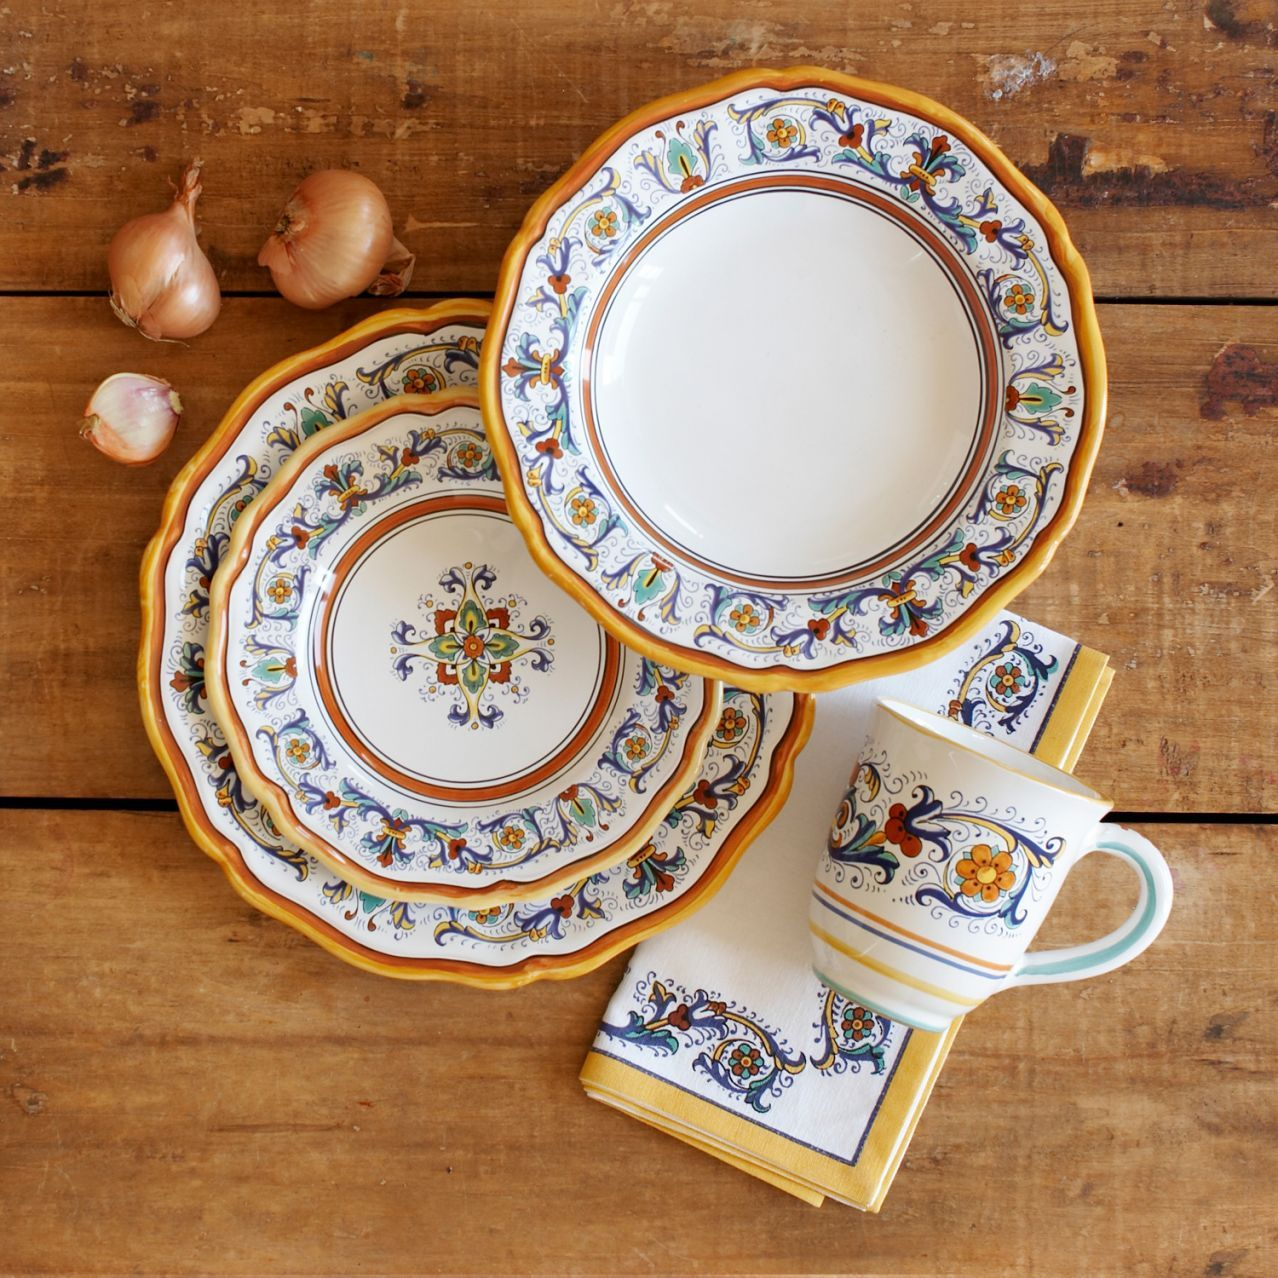 16pc Deruta Dinnerware Set at Sur La Table. Italian PotteryDish SetsTuscan StyleThanksgiving ... & Nova Deruta 16-Piece Dinnerware Set | Dinnerware Tuscan style and ...